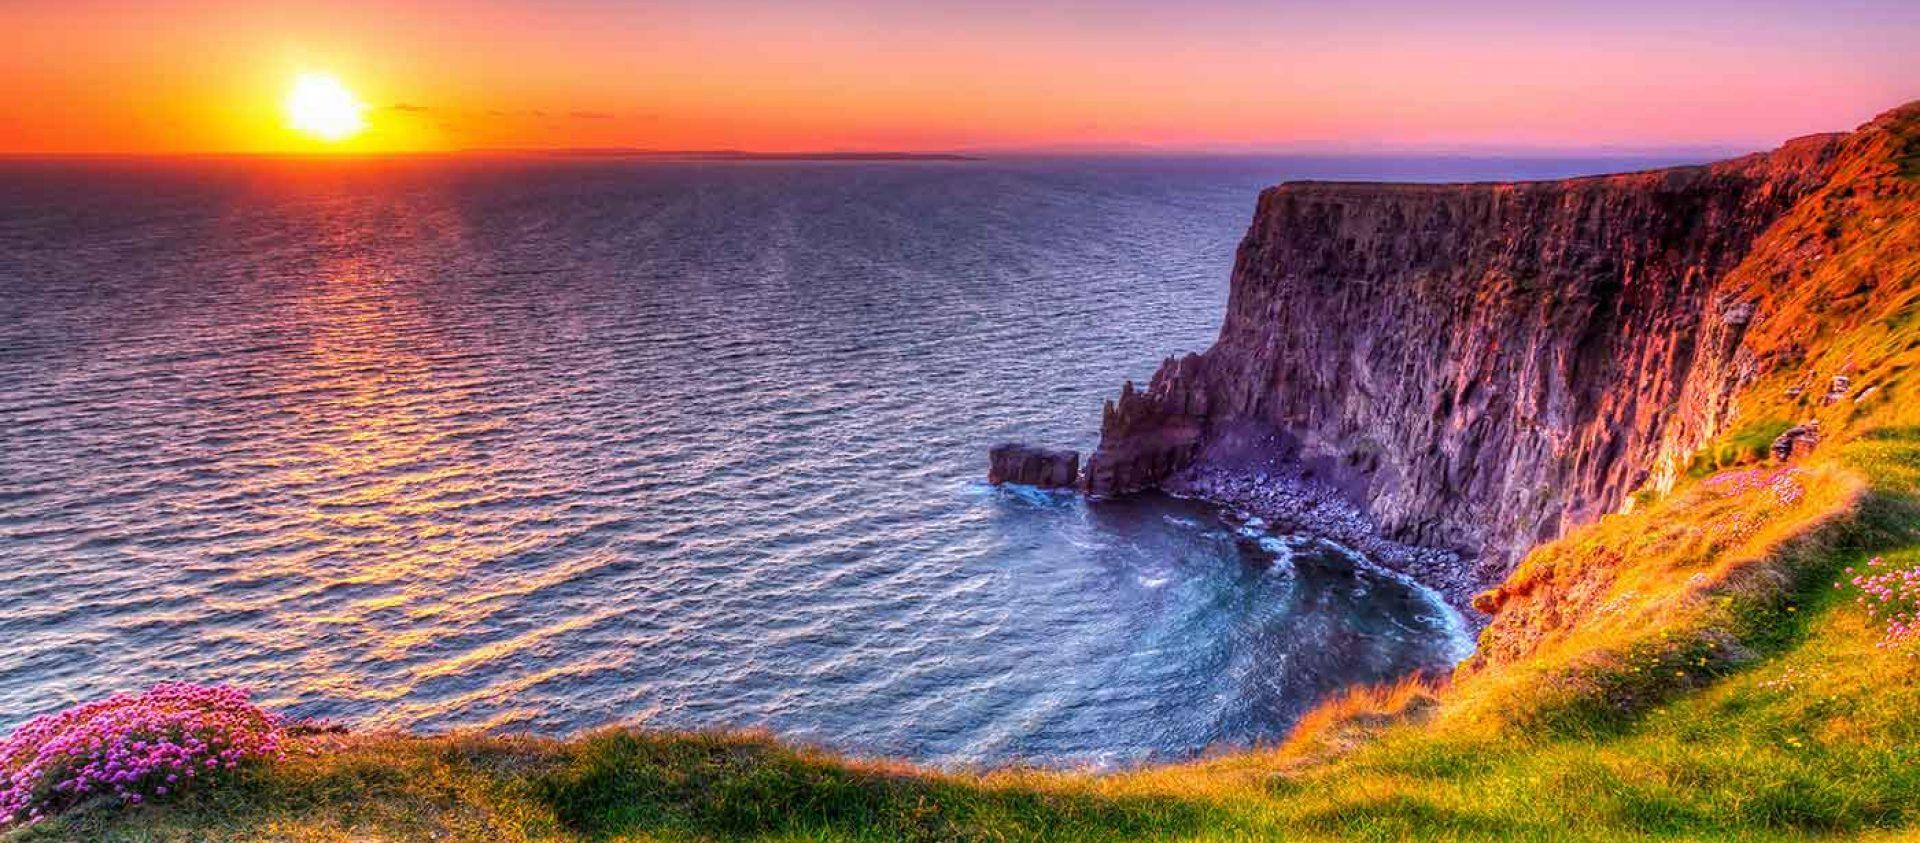 Ireland & Beyond